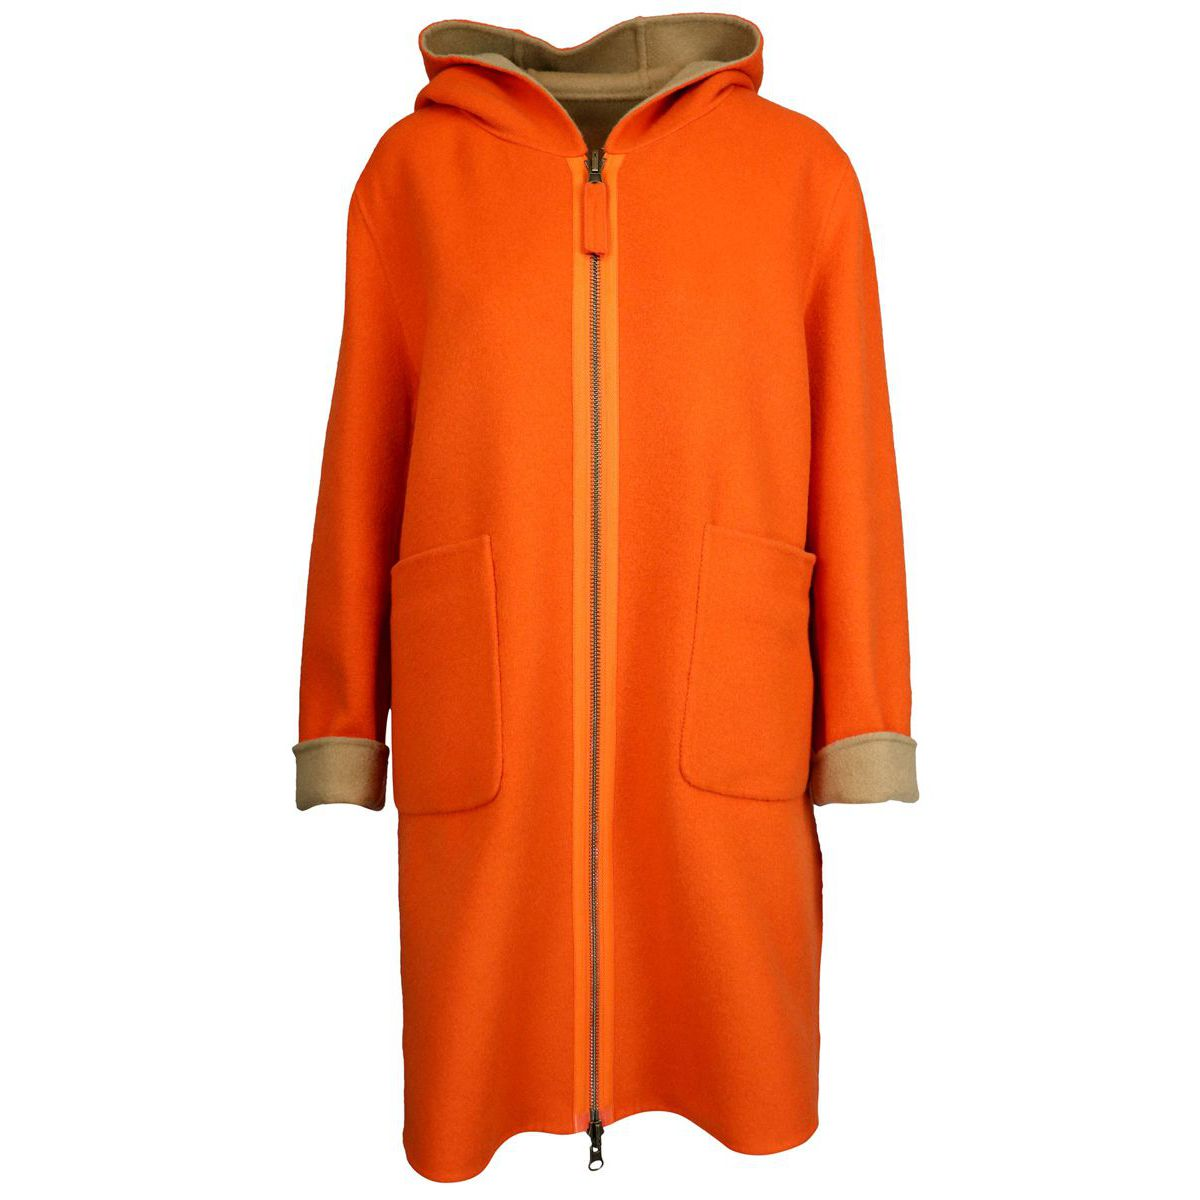 Double cout jacket Orange / beige Maliparmi